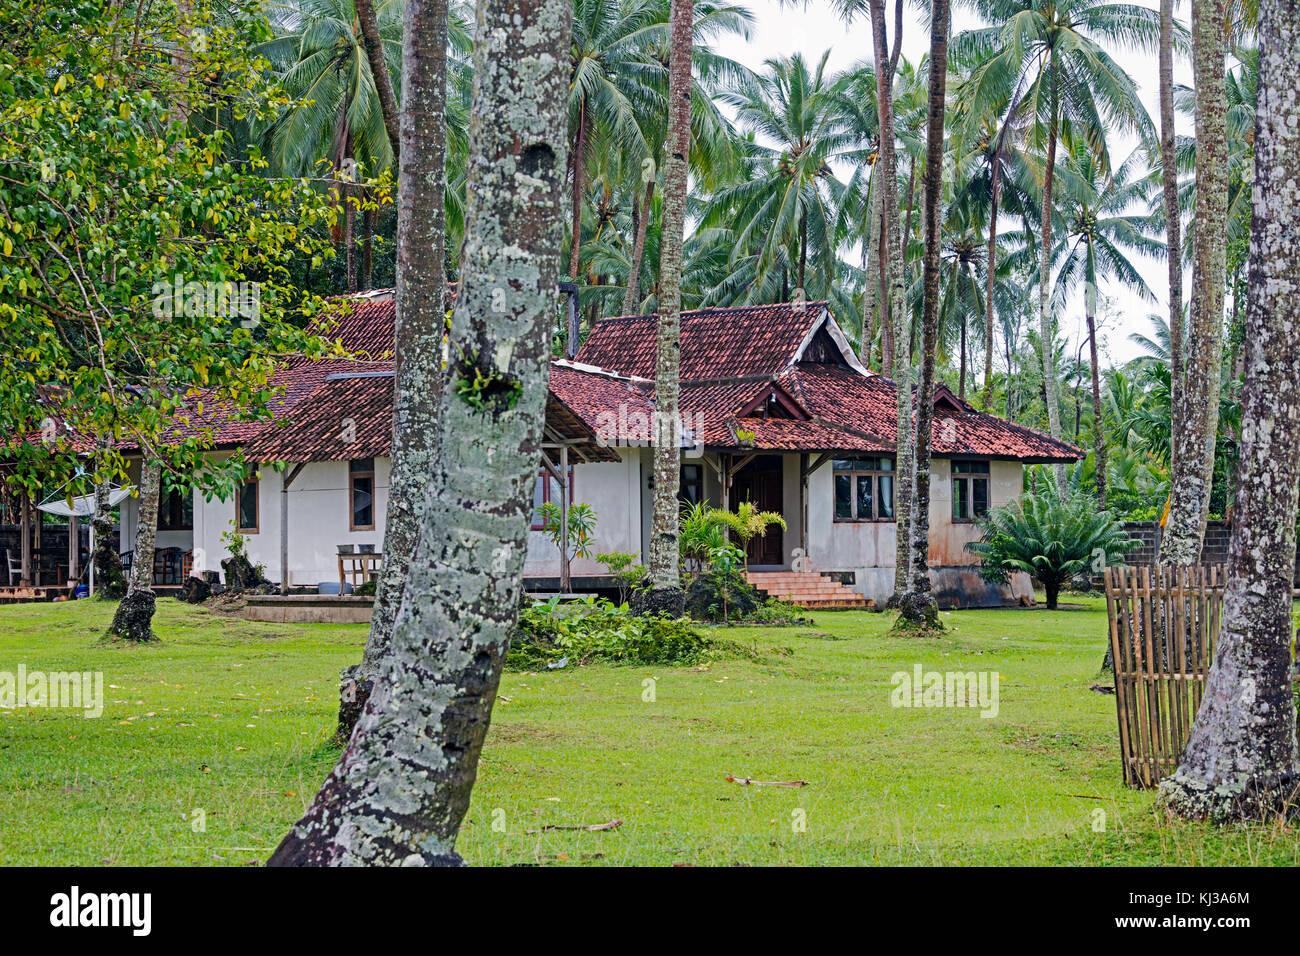 Colonial plantation house in Tamanyaya, western Java, Indonesia - Stock Image